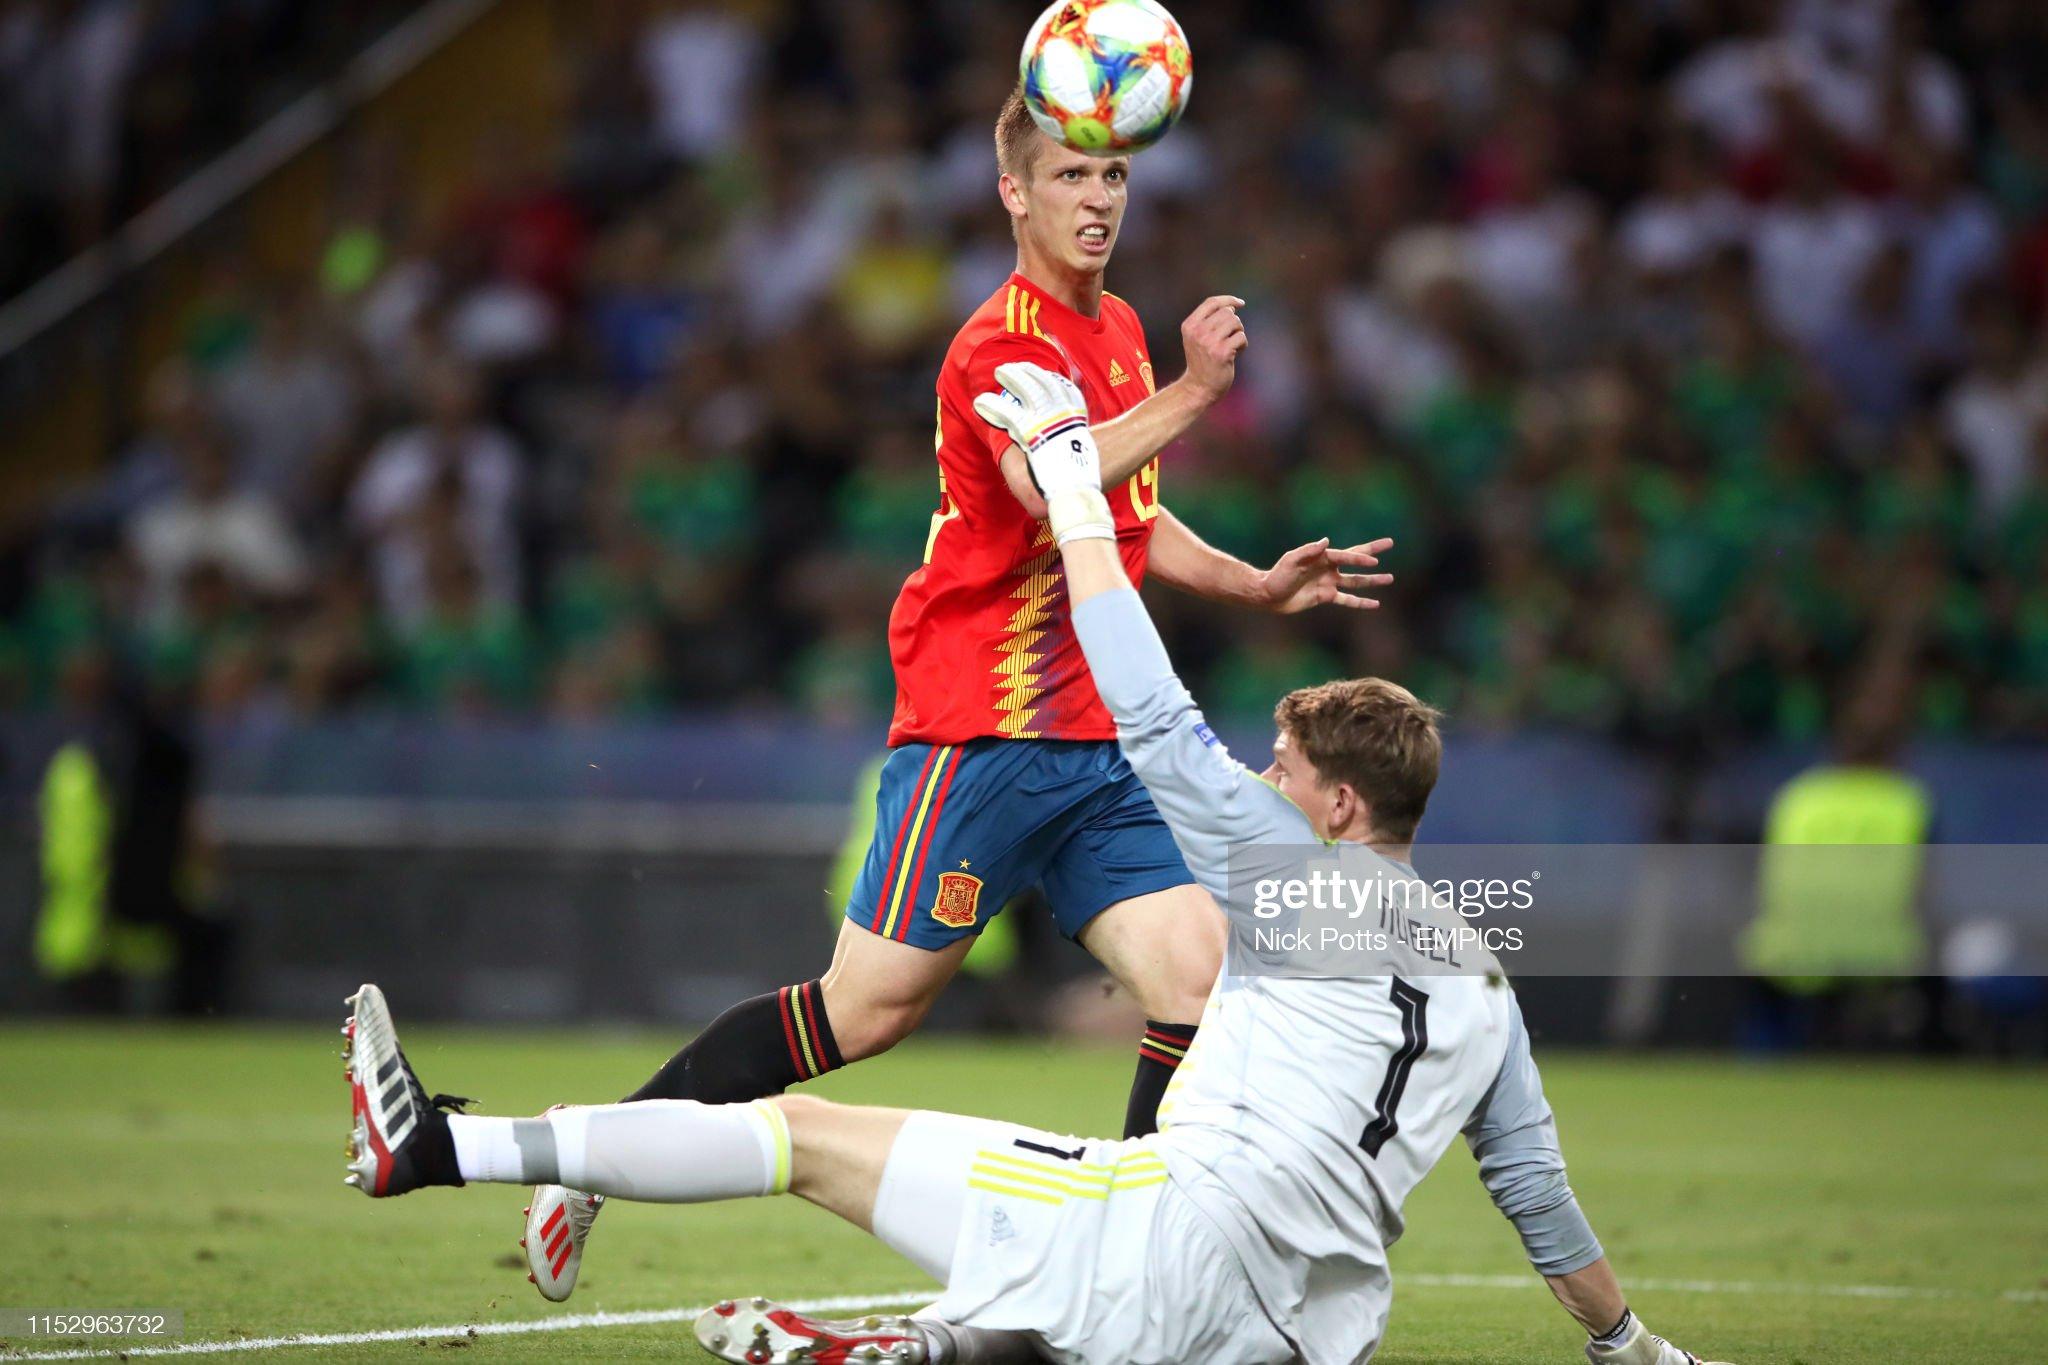 Spain U21 v Germany U21 - UEFA European Under-21 Championship - Final - Stadio Friuli : Fotografia de notícias